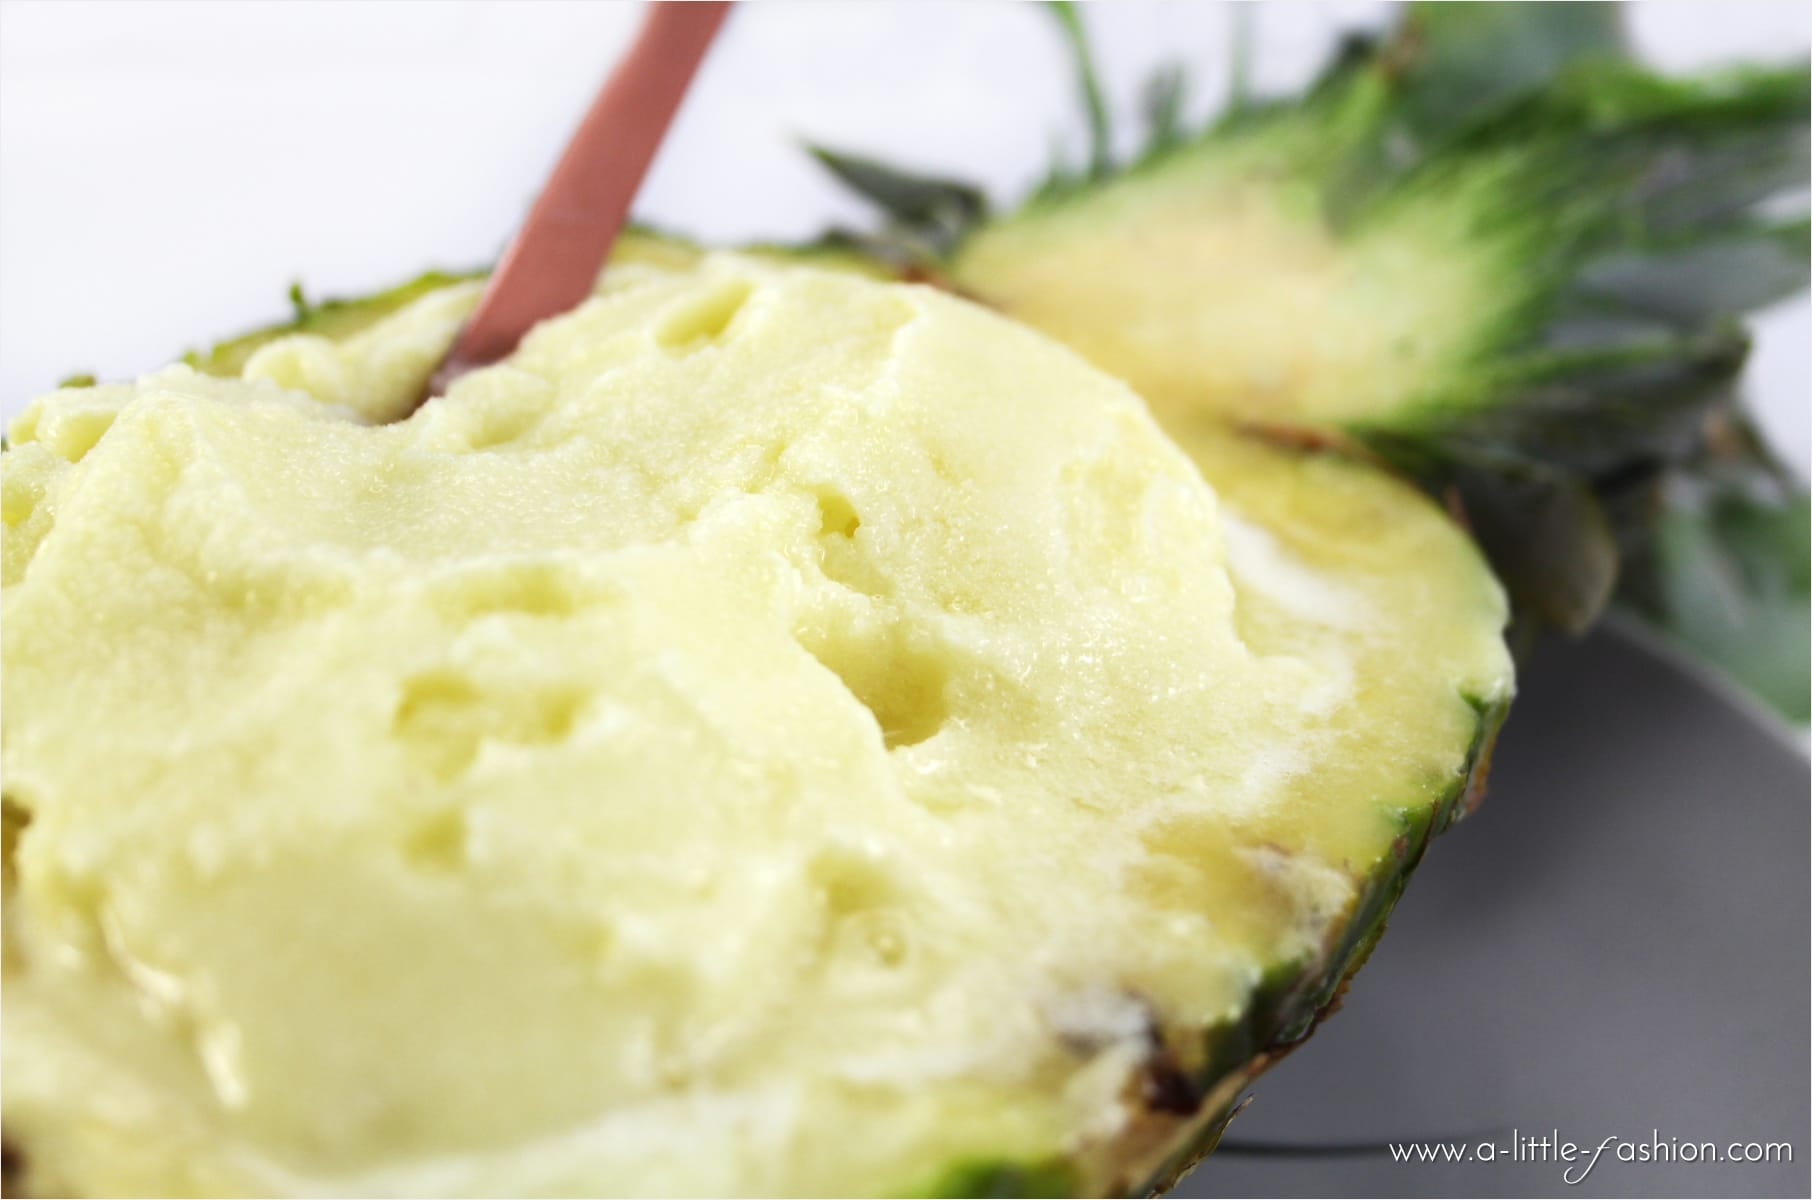 rezept_ananas-kokos-sorbet_eis_sommer_food_vitamix1-min